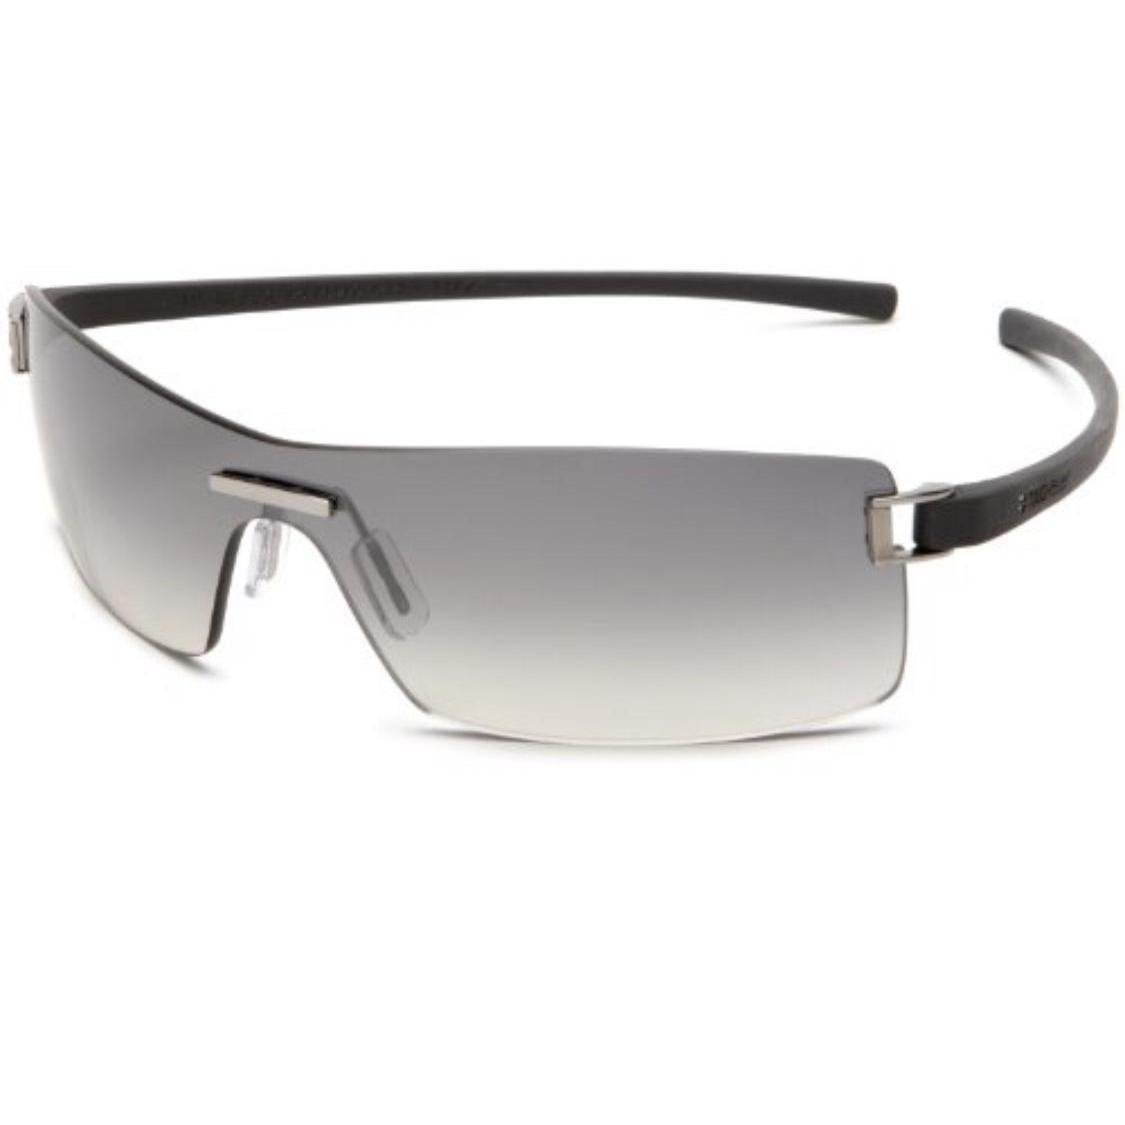 320541621a9 Singapore. Tag Heuer Club 7506 108 Black Grey Sunglasses